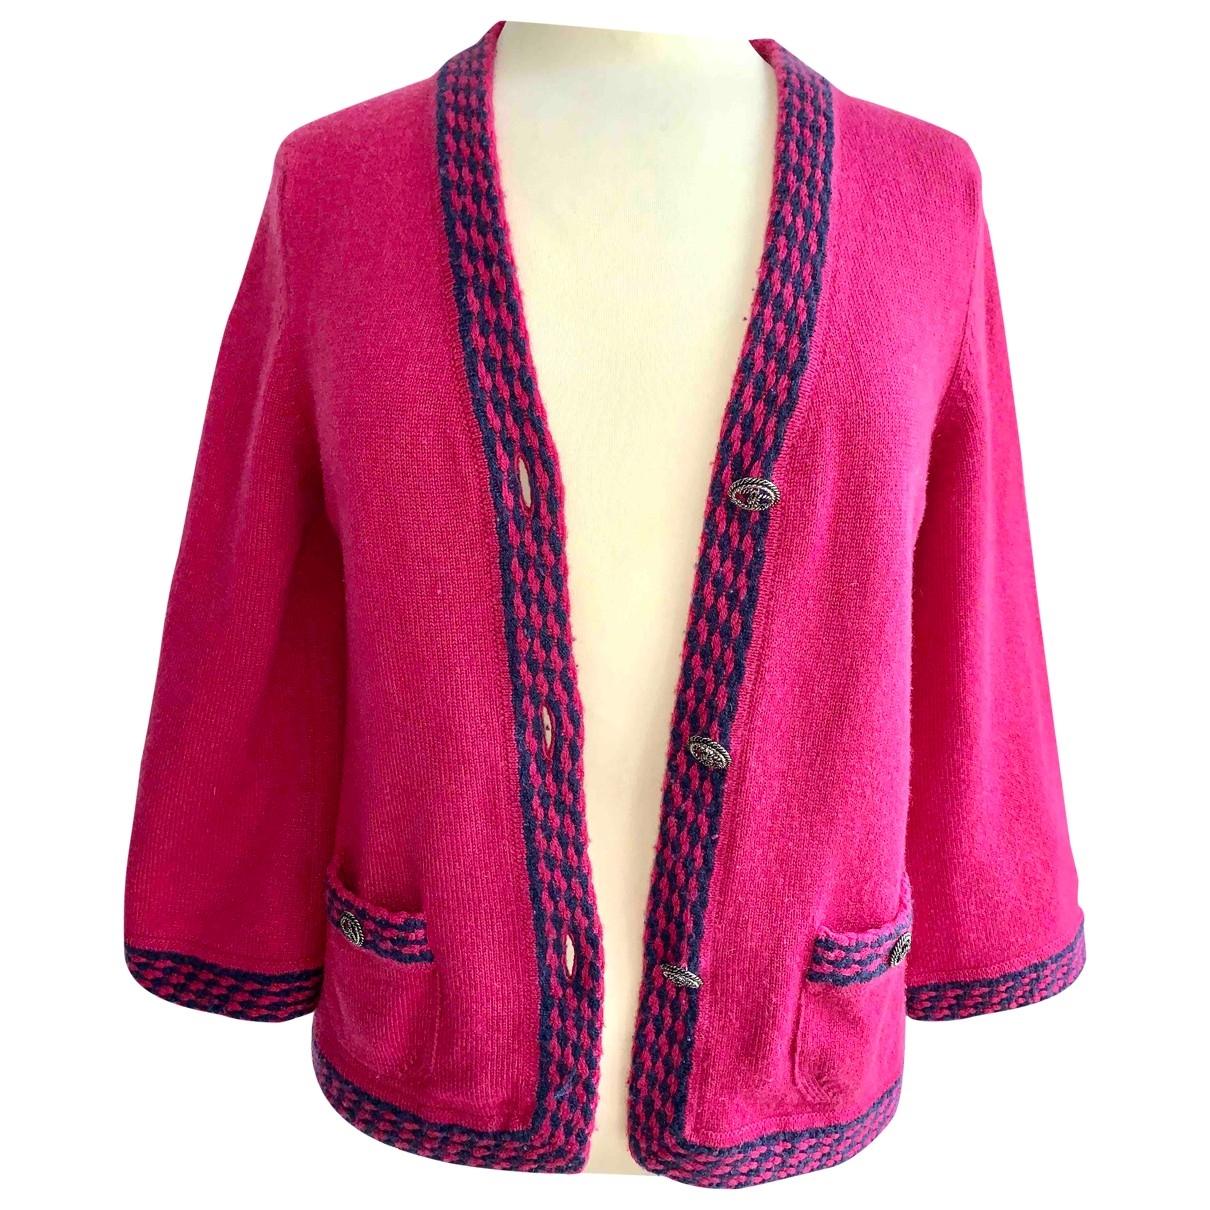 Chanel \N Pink Cashmere jacket for Women 36 FR